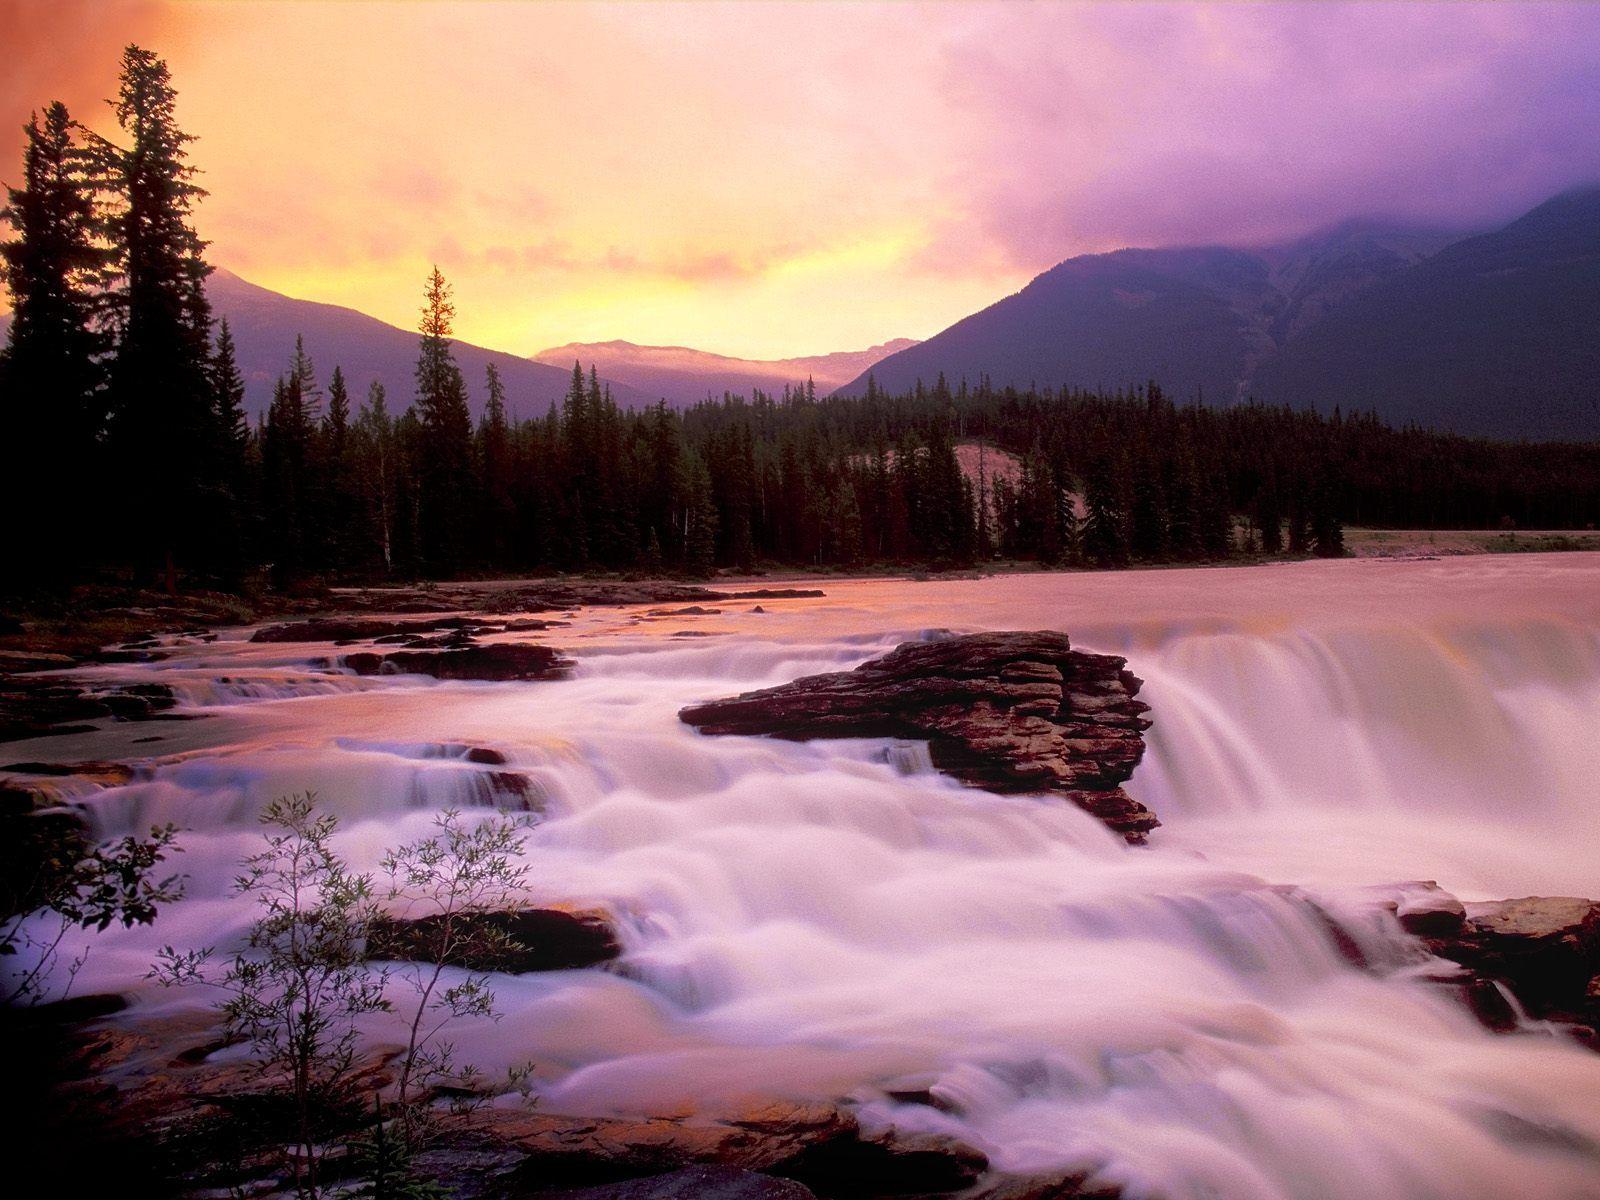 canada+natura | Natural Wonder Alberta Canada - Japan Photography Desktop Wallpapers ...